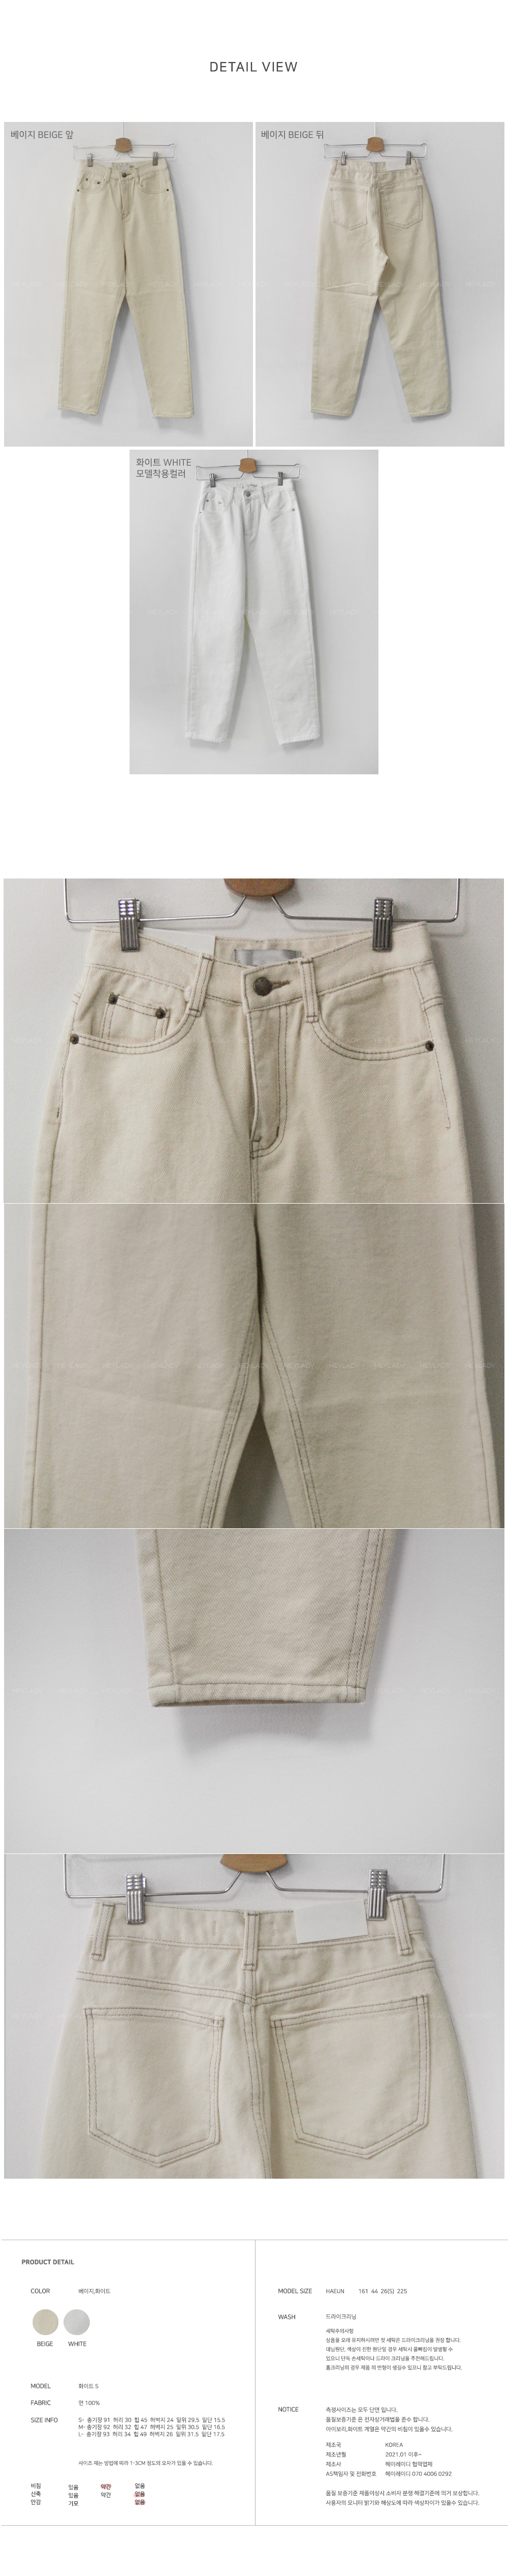 Fourset straight cotton pants